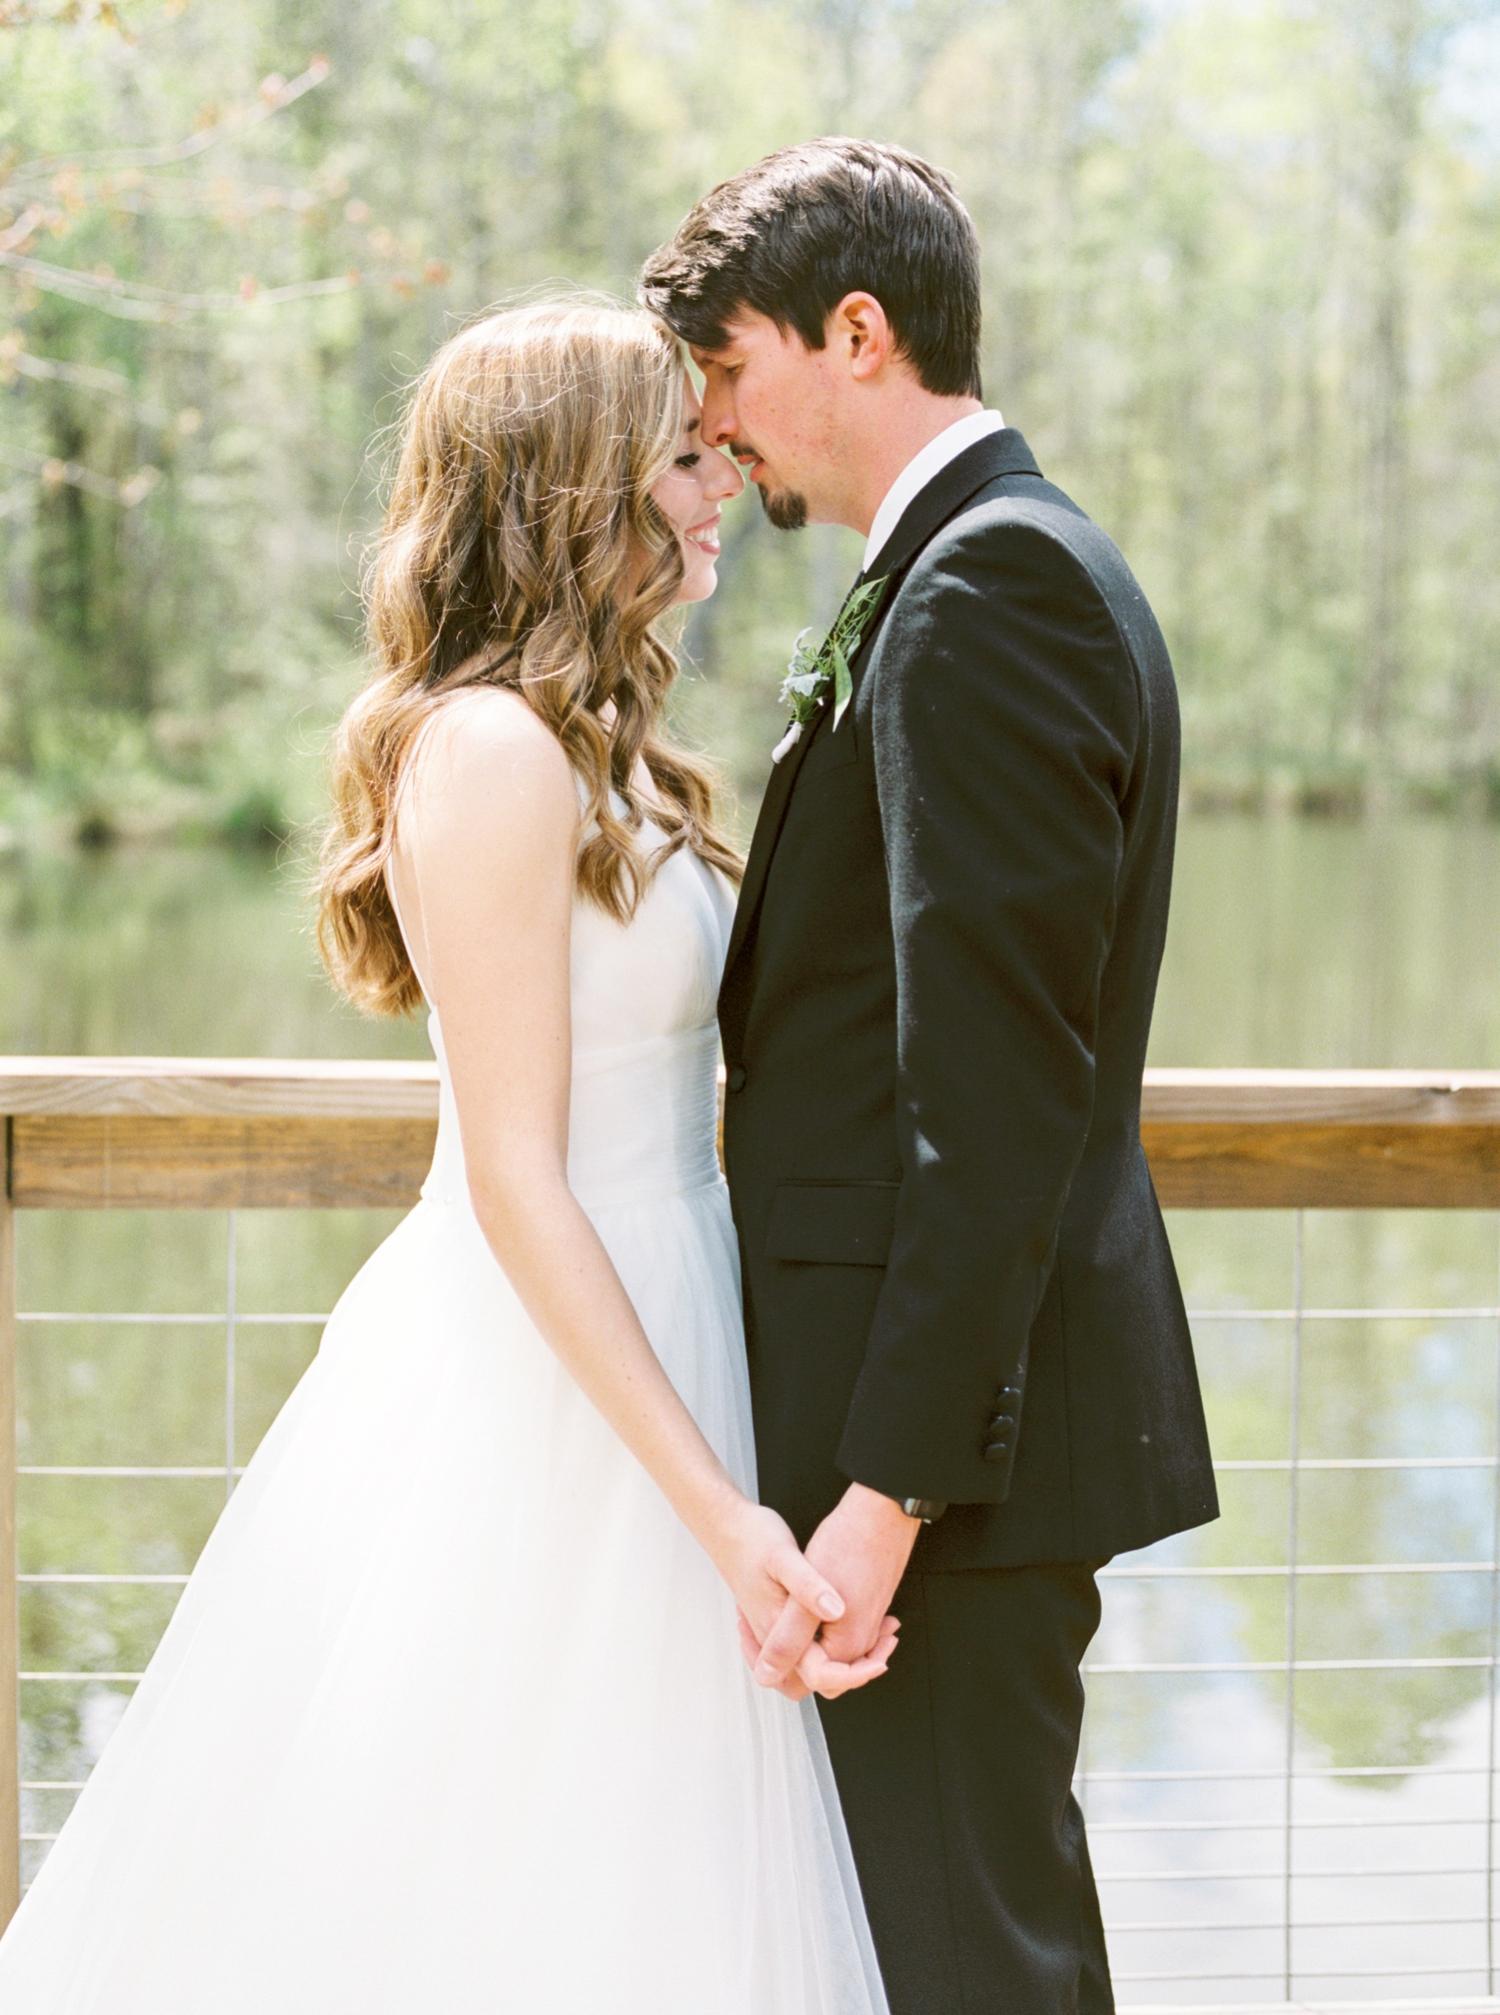 fine-art-film-charleston-south-carolina-wedding-photographer-atlanta-georgia_3426.jpg